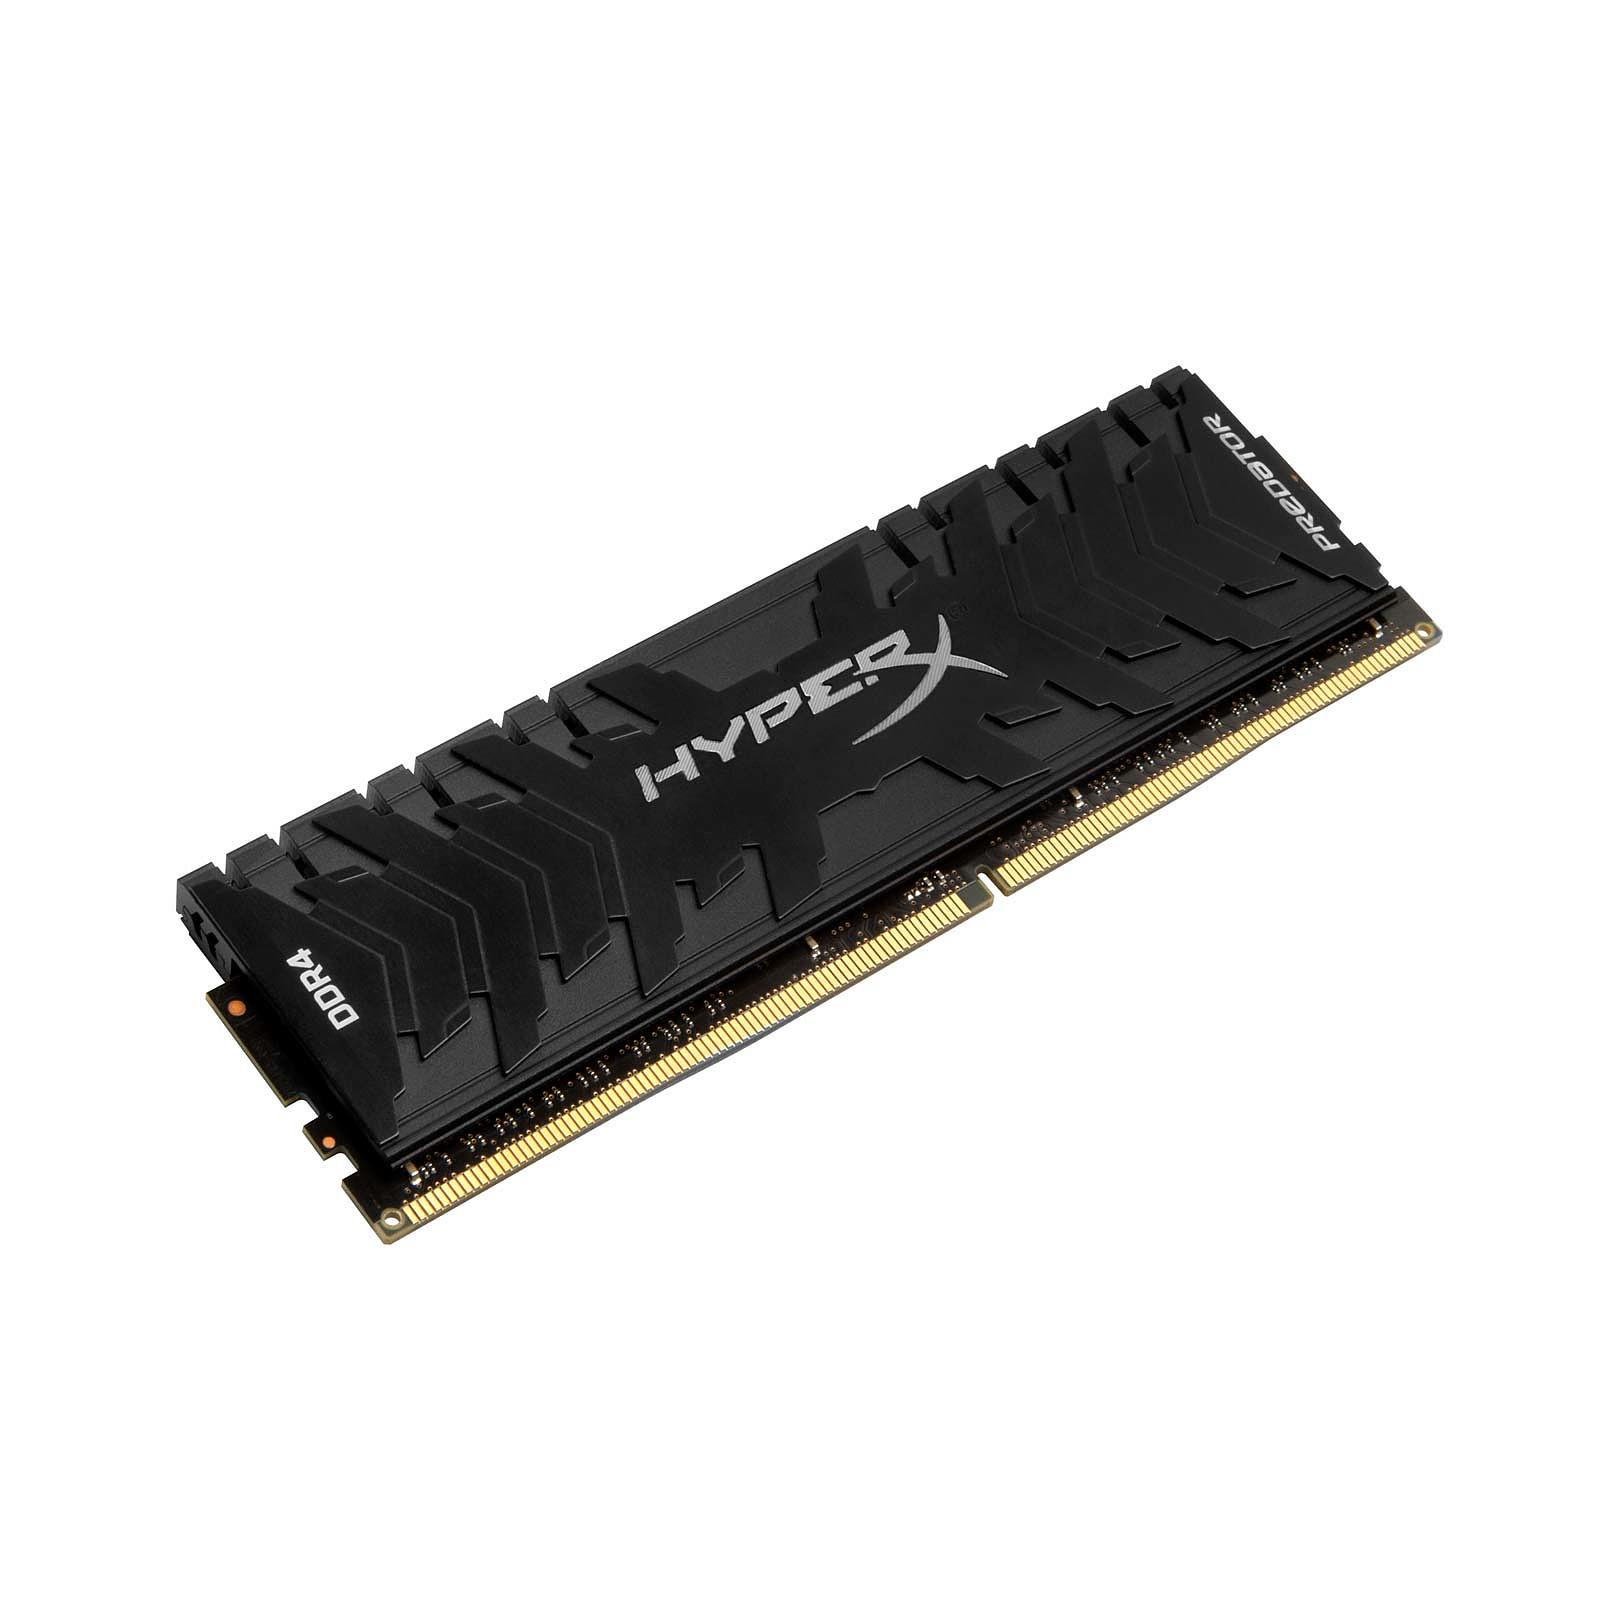 HyperX Predator Noir 8 Go DDR4 3200 MHz CL16